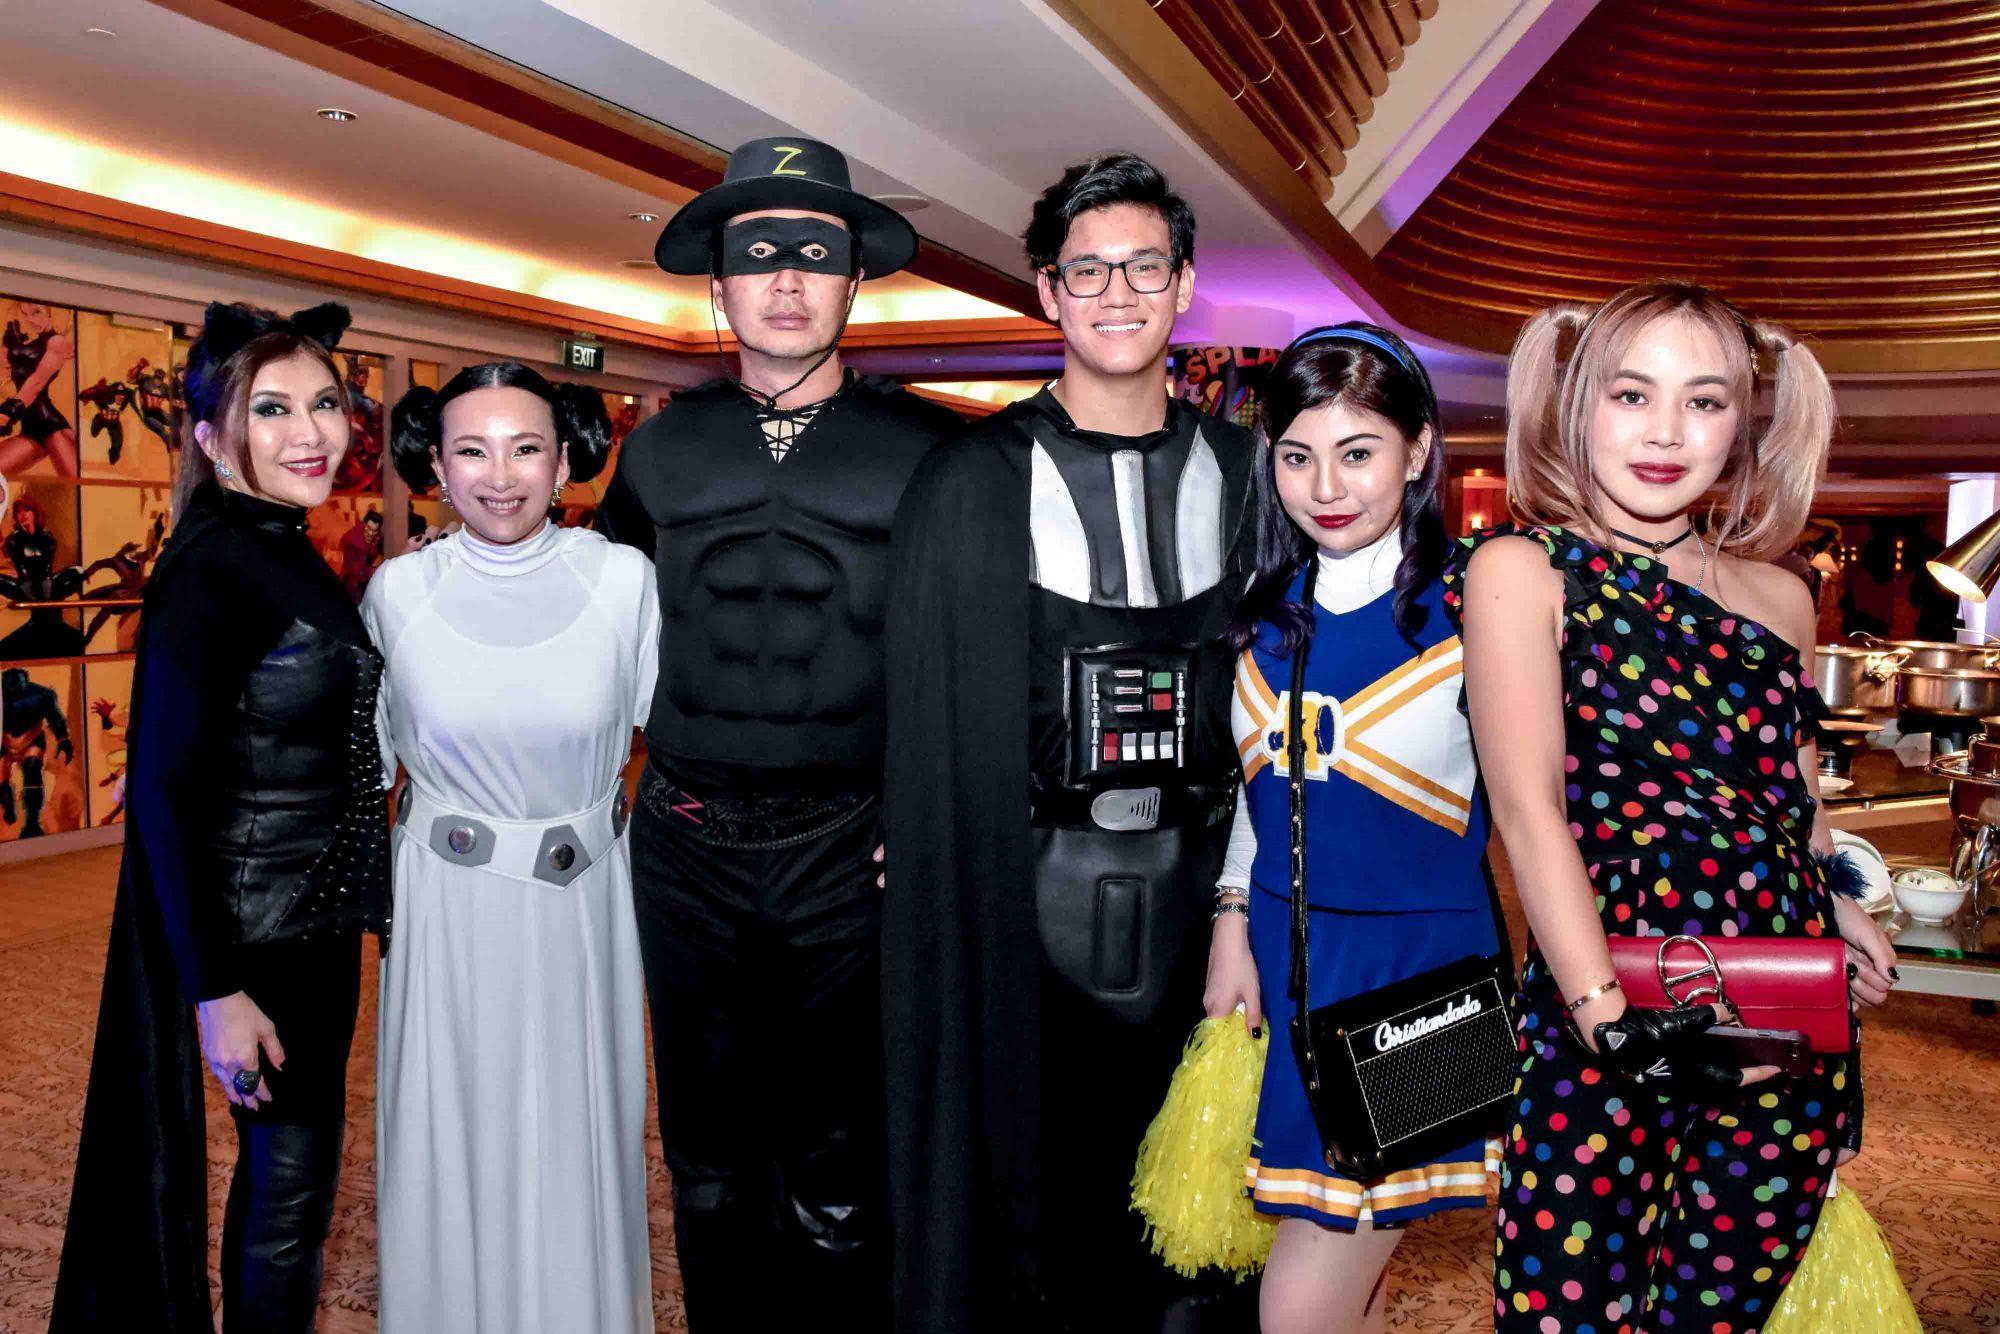 Belinda Chua, Caroline Low-Heah, Heah Sieu Min, Sabrina Ho, Chloe Ng